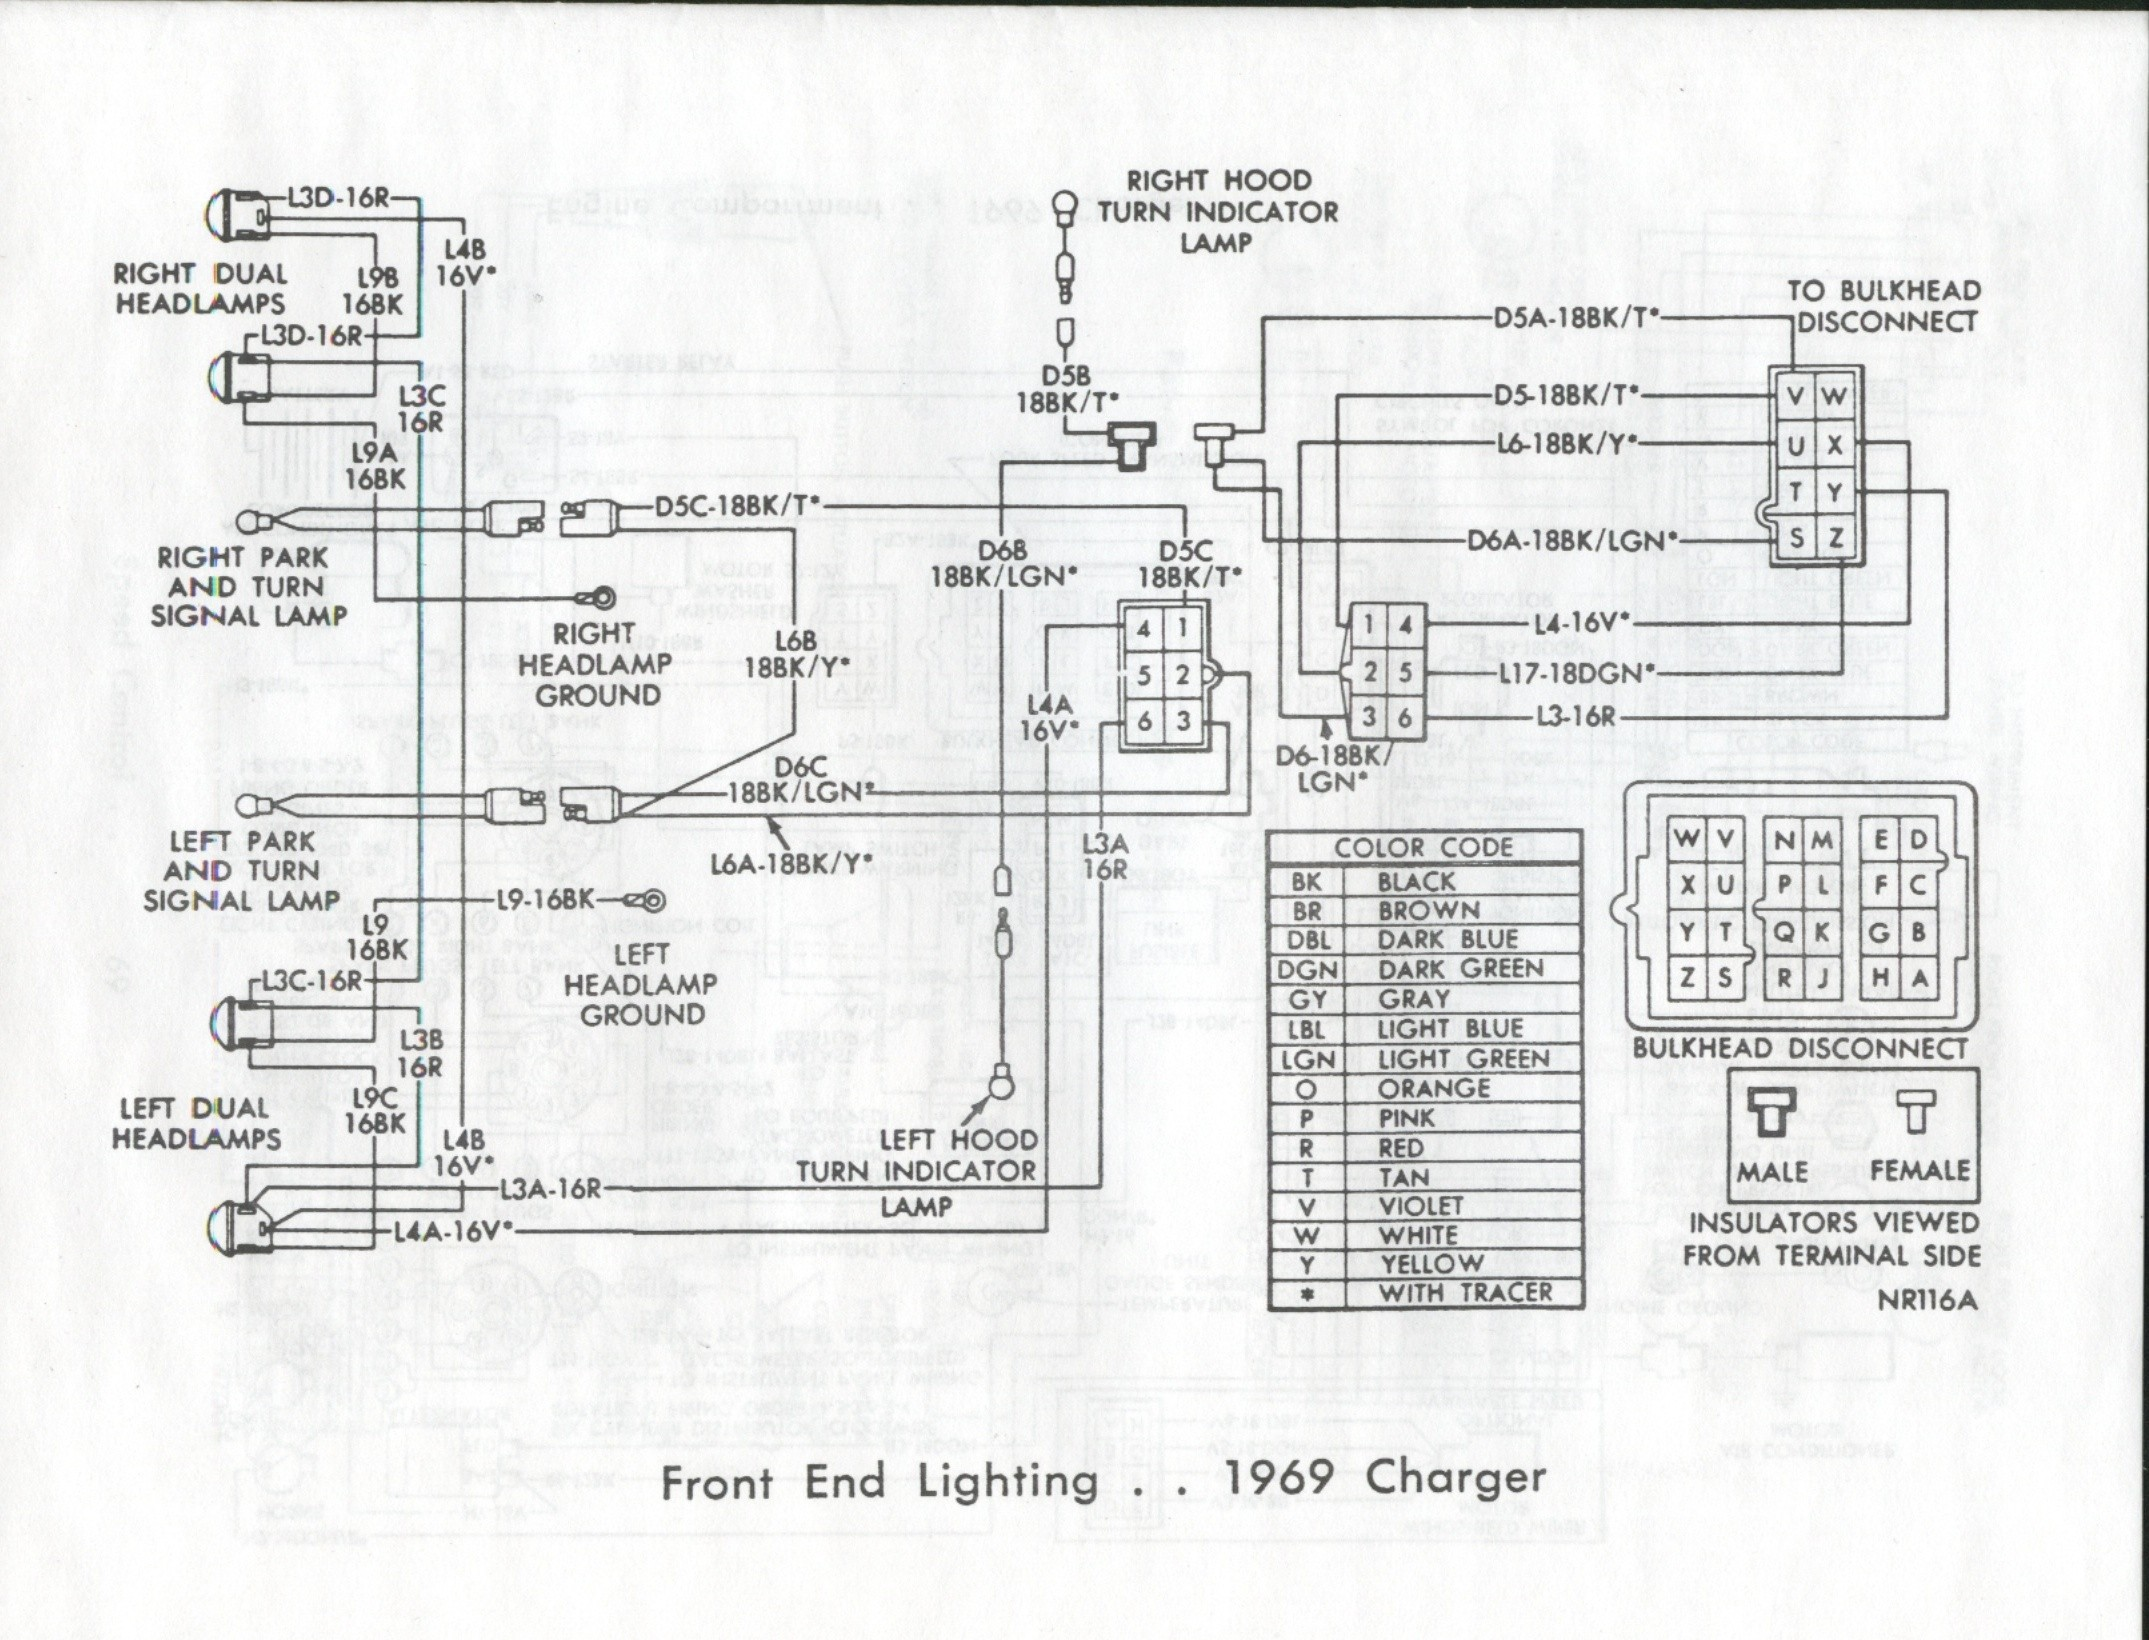 69 pontiac firebird wiring diagram